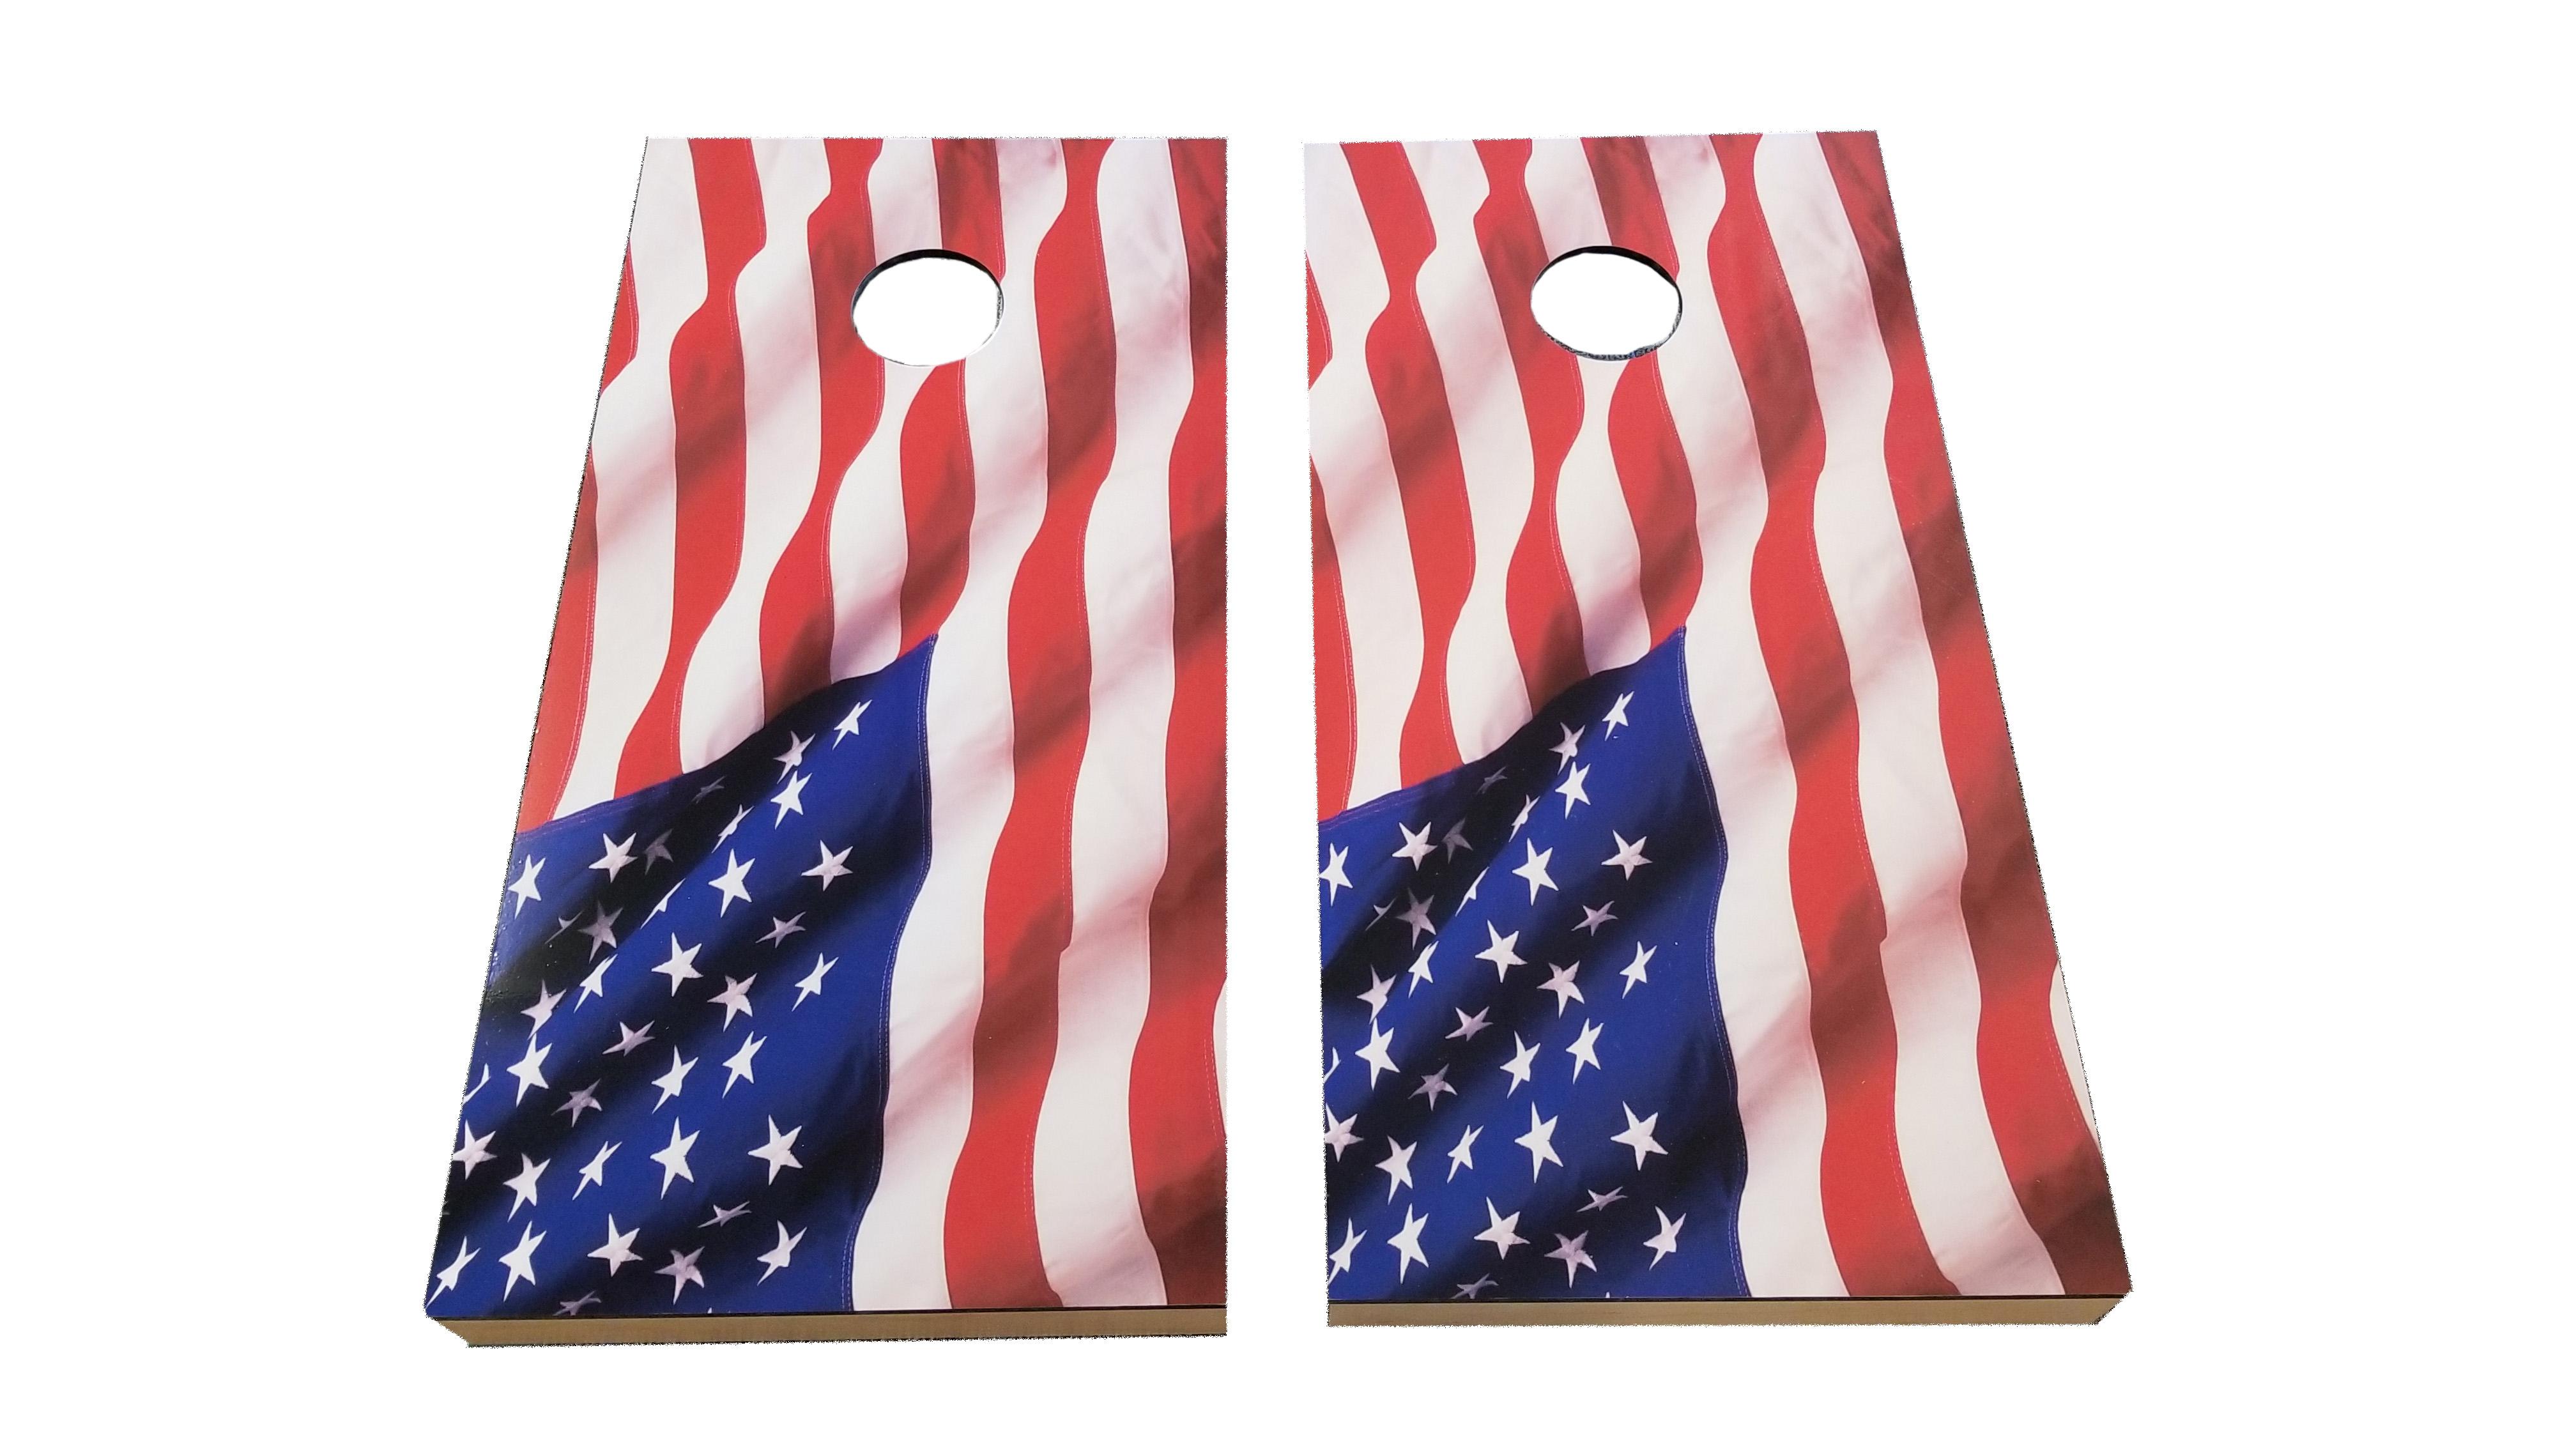 https://0901.nccdn.net/4_2/000/000/05c/c64/cornhole-american-flag.jpg